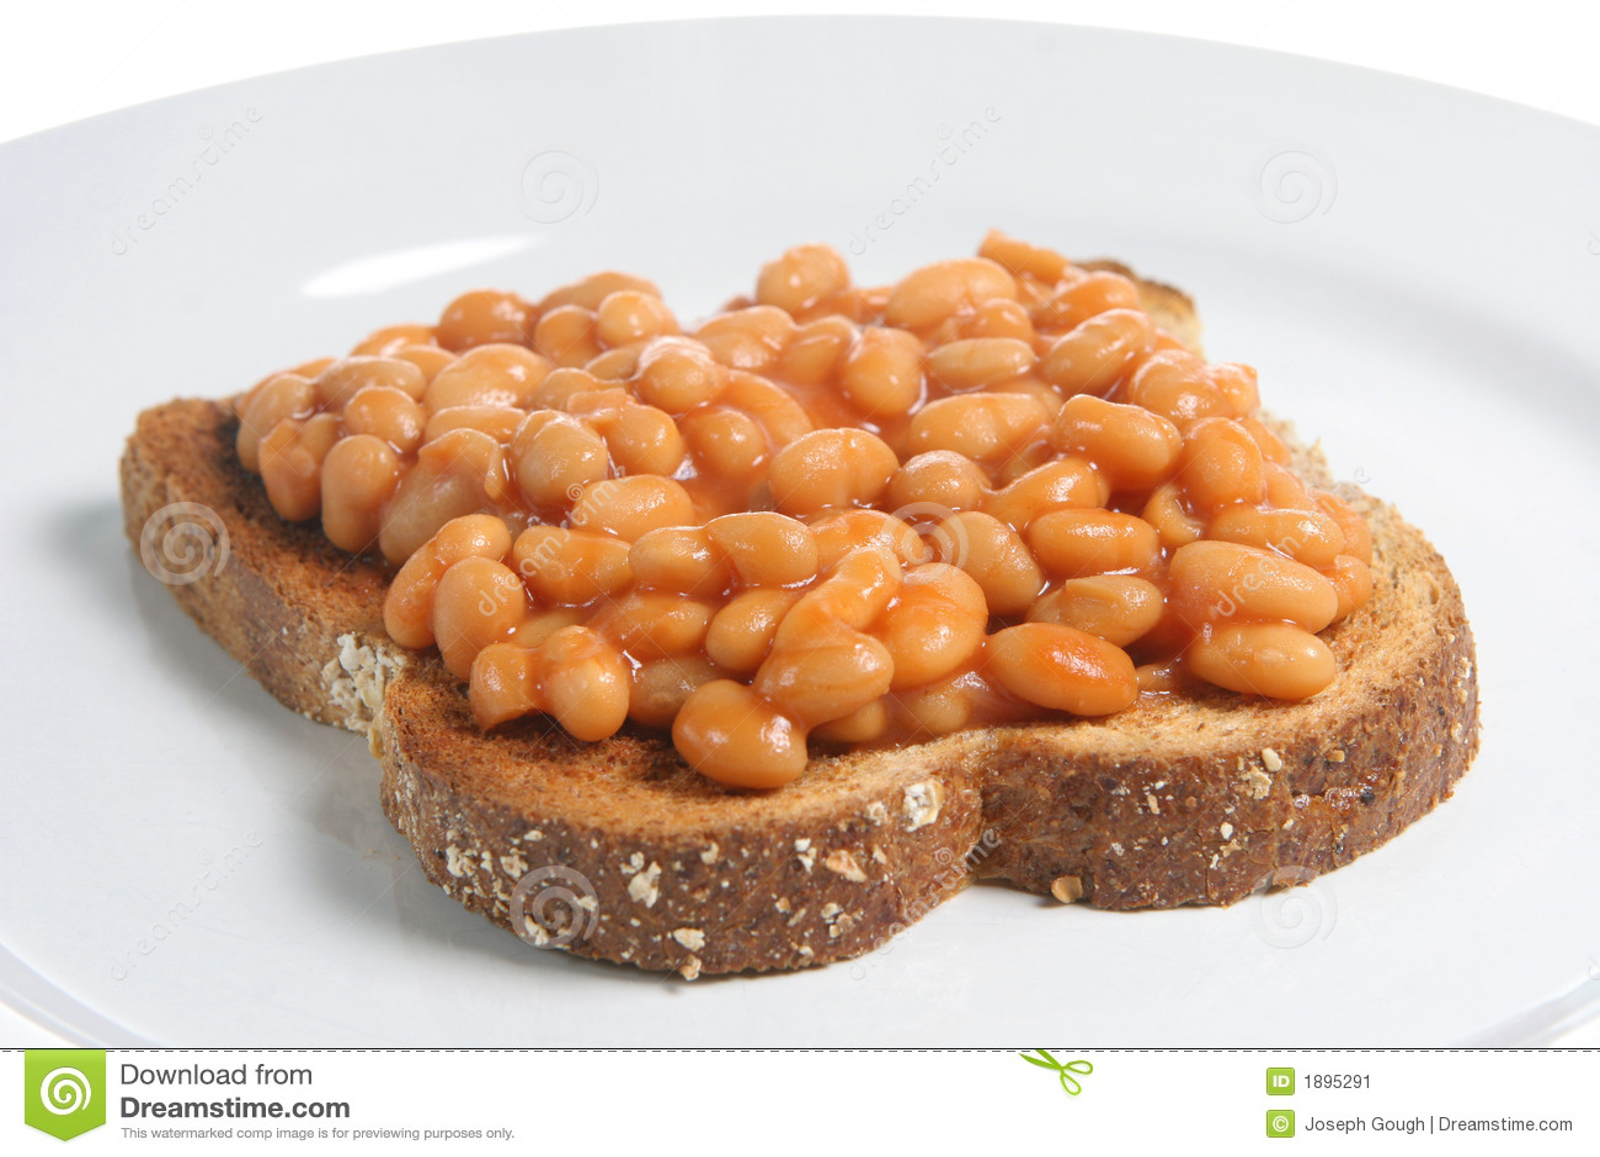 baked-beans-toast-1895291.jpg